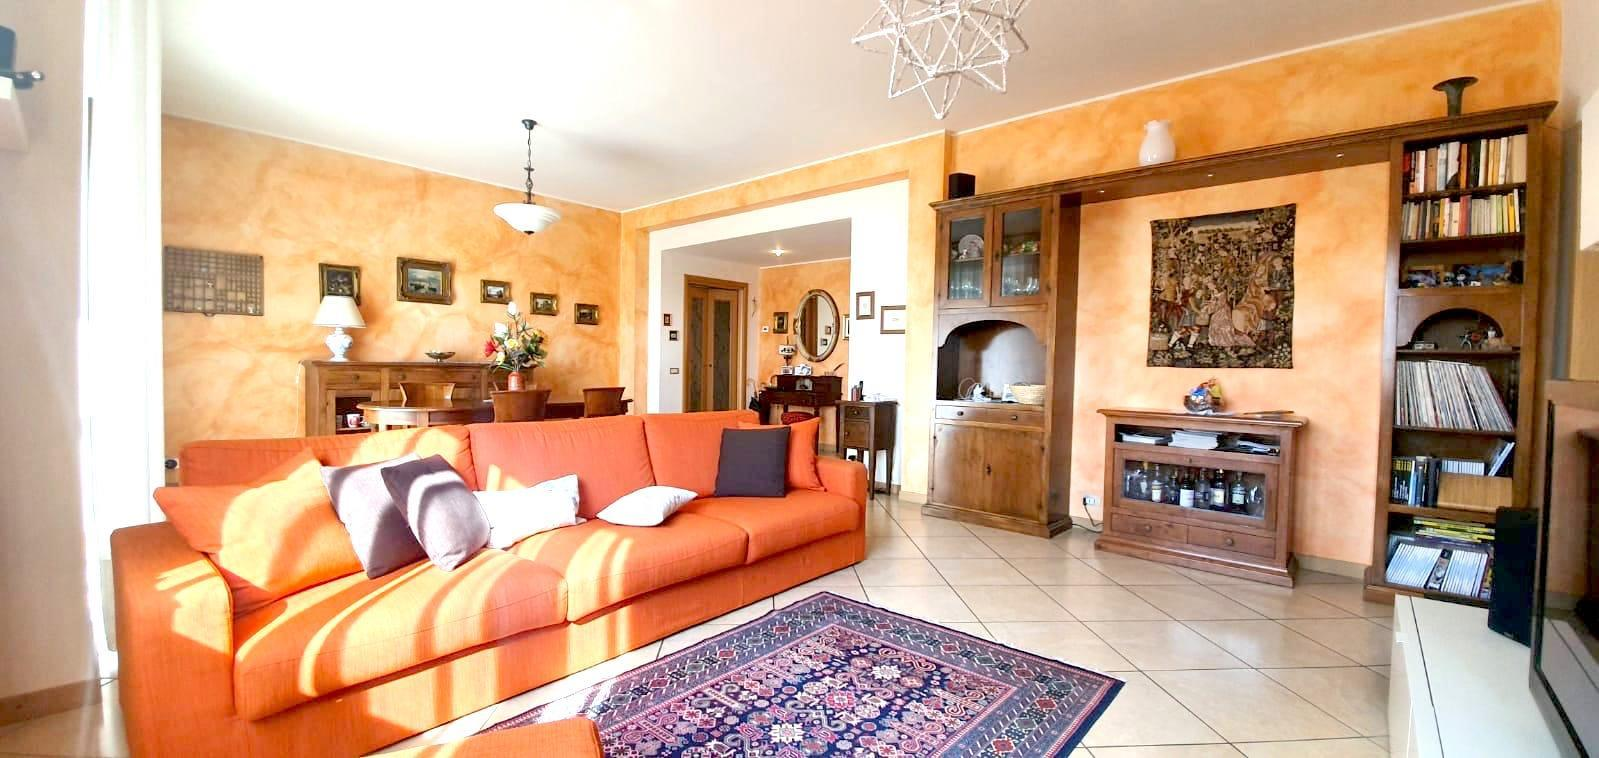 Vendita 5 Locali Appartamento Cernusco Lombardone Via Giuseppe Verdi 1 240064